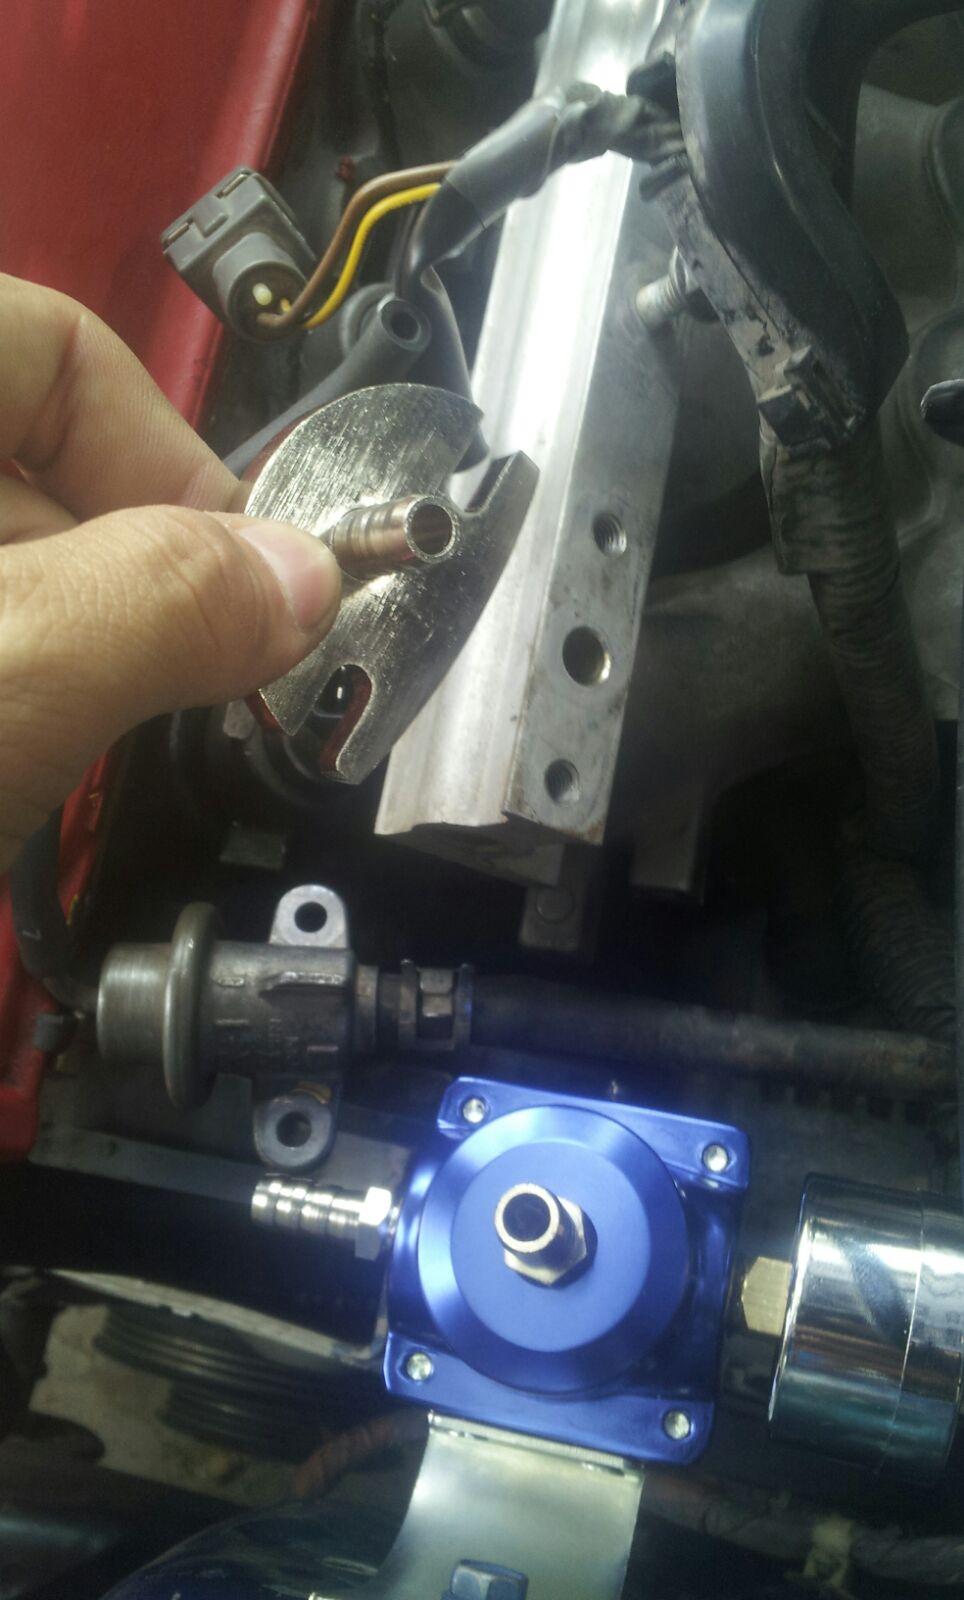 Walbro High Performance GCA3366 Electric Fuel Pump Kit Fits 92-00 Civic Integra